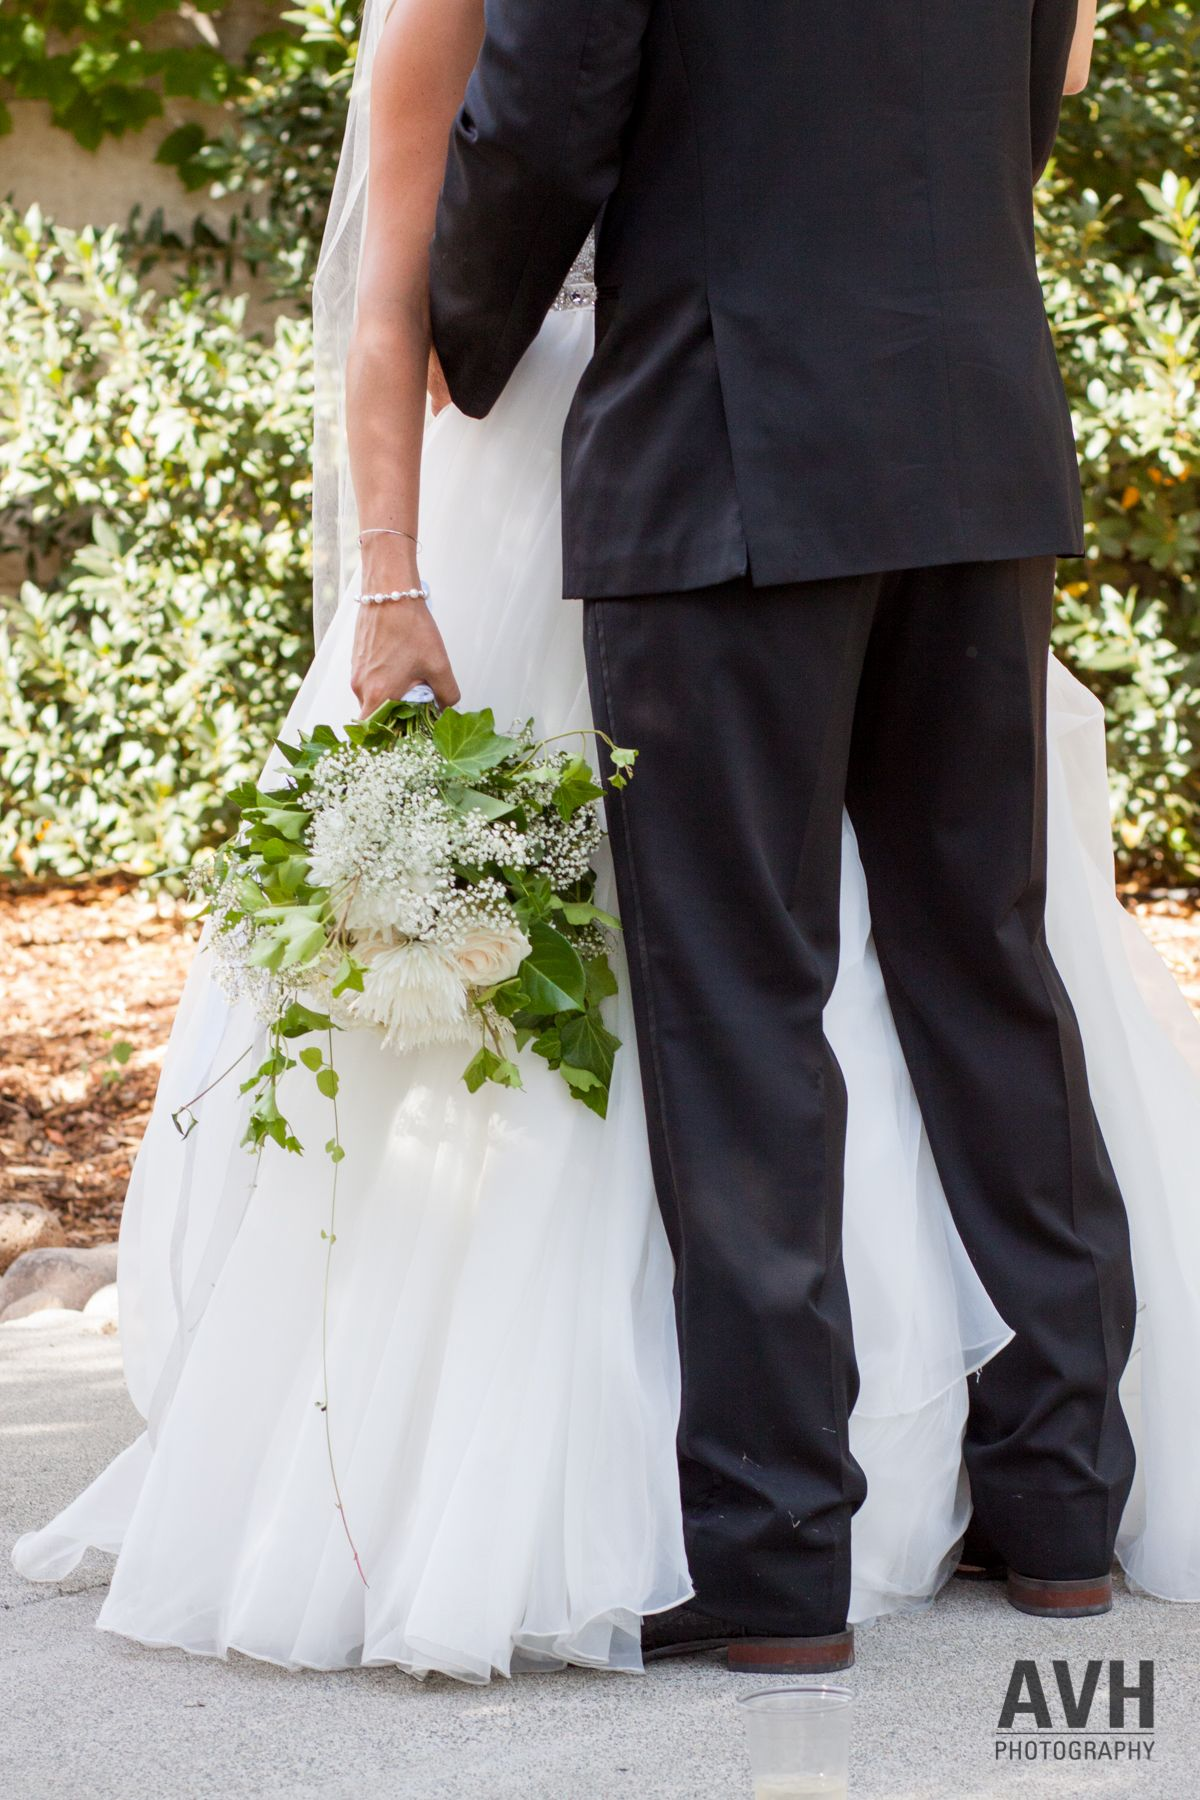 Wedding summer wedding bride and groom bouquet photo by avh